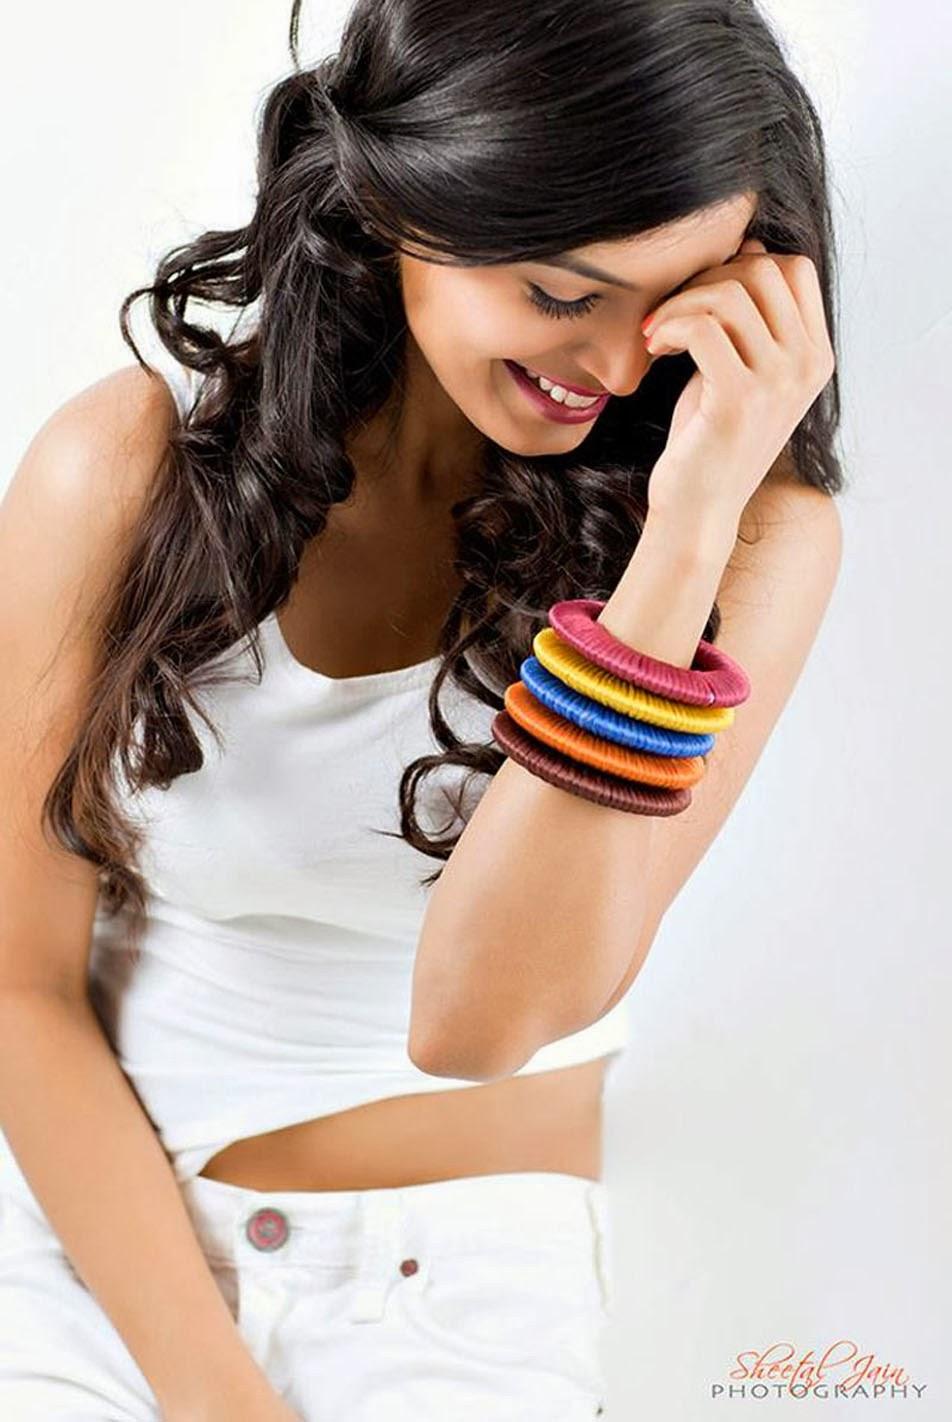 Actress sanchita shetty sex tape alleged 1